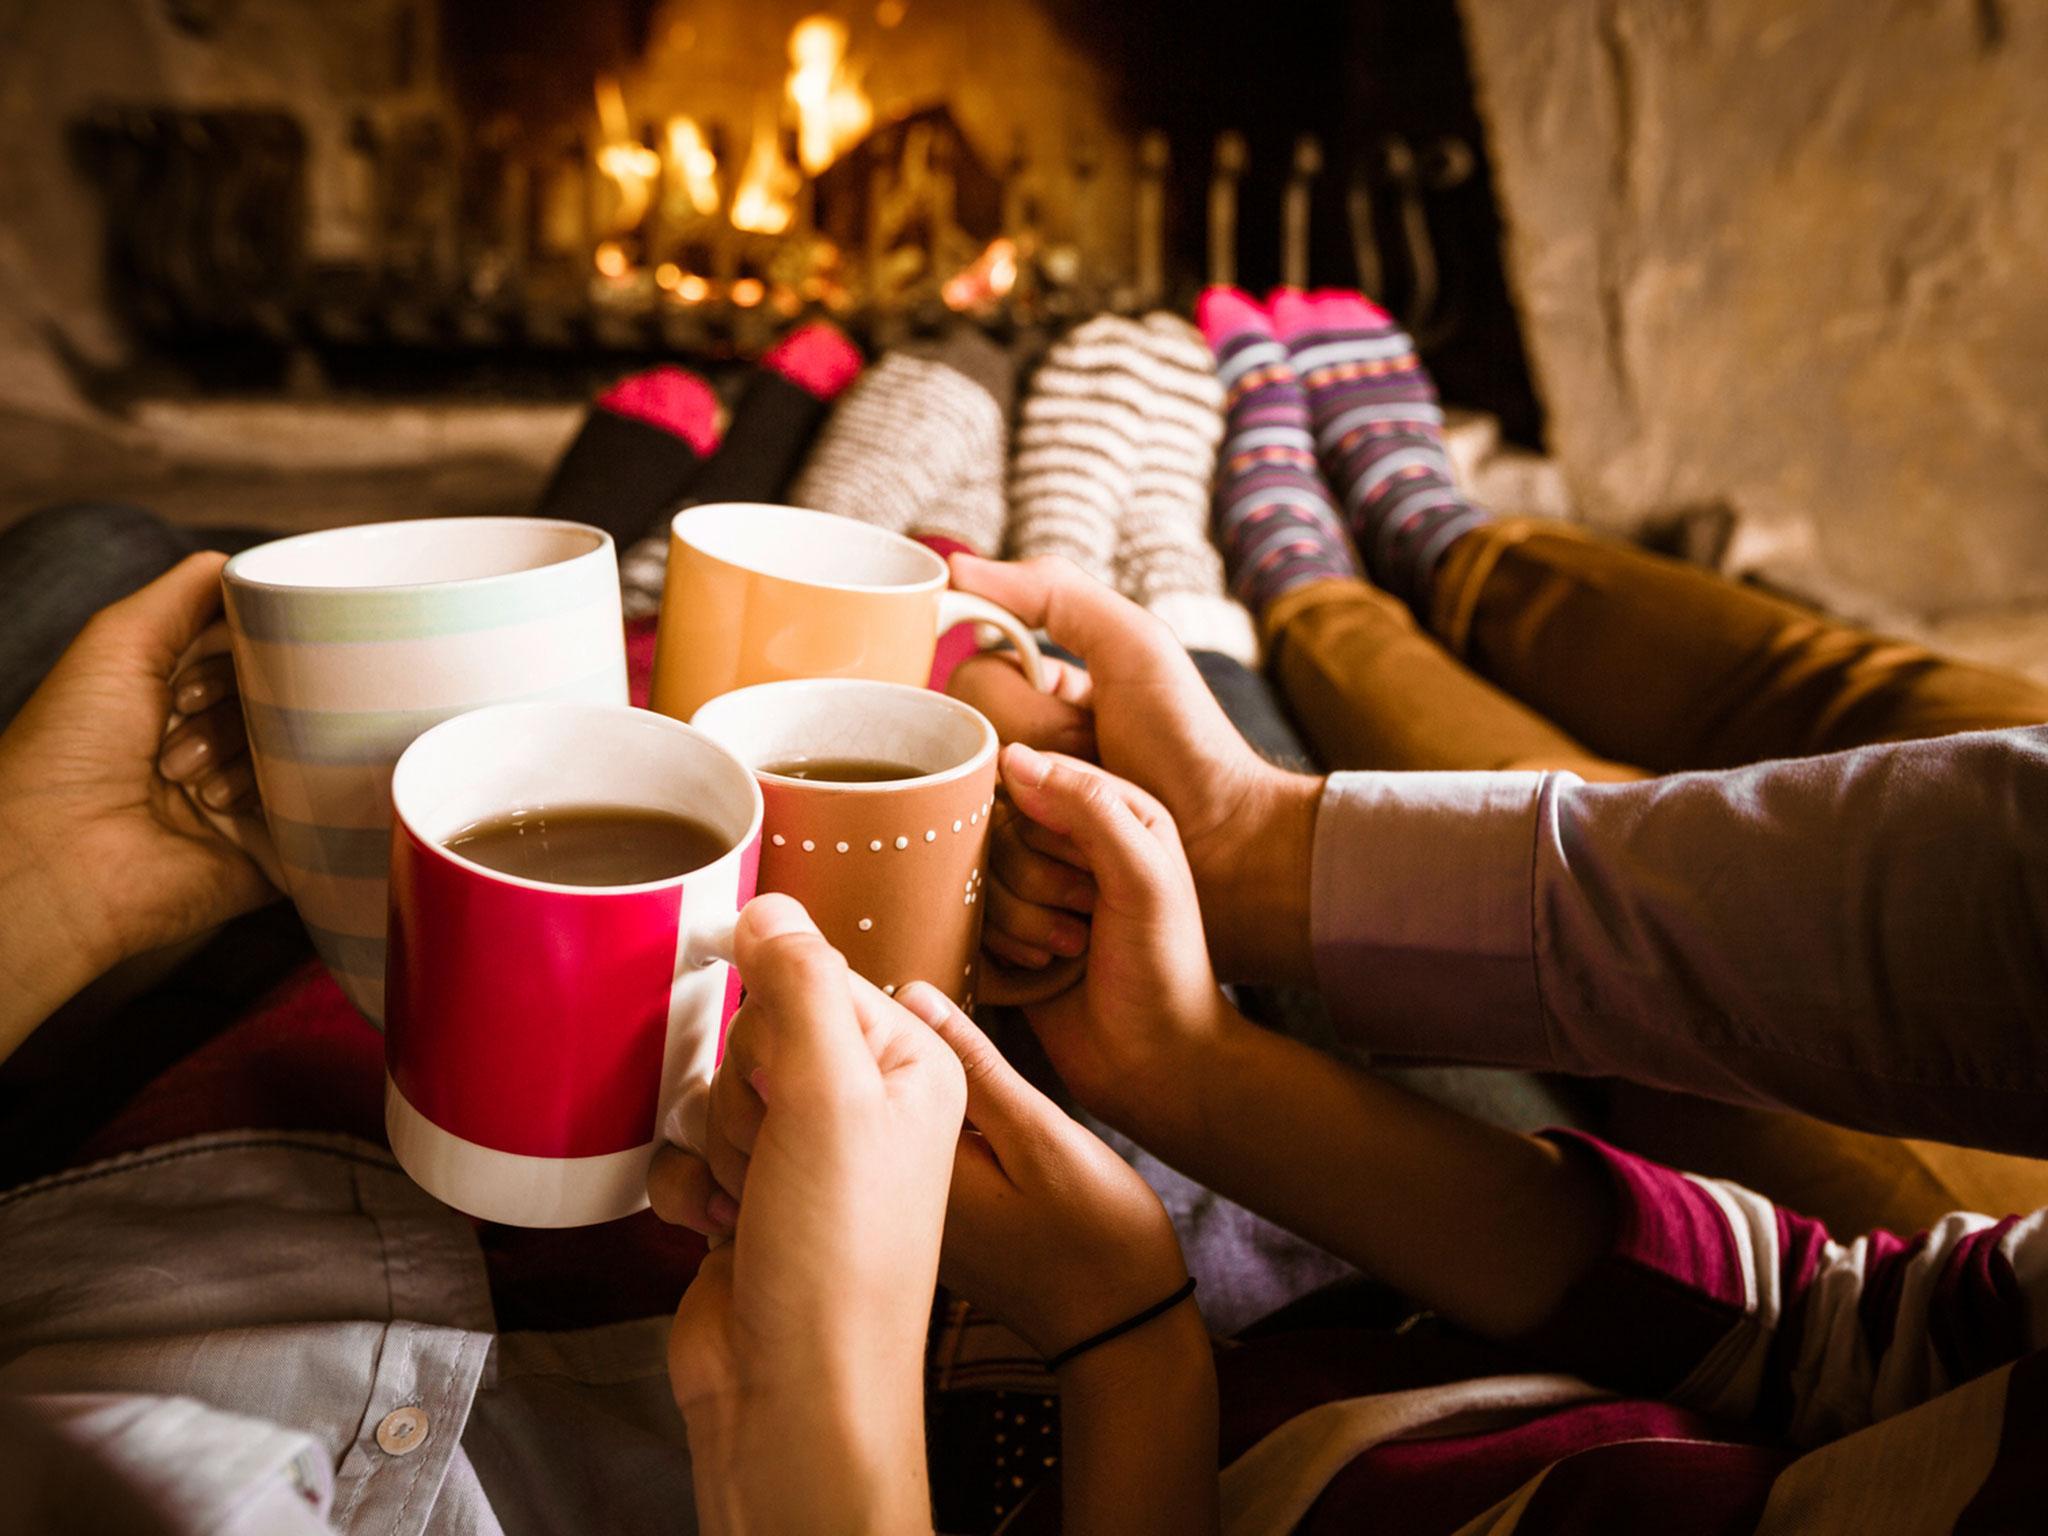 hot-chocolate-istock-izabela-habur